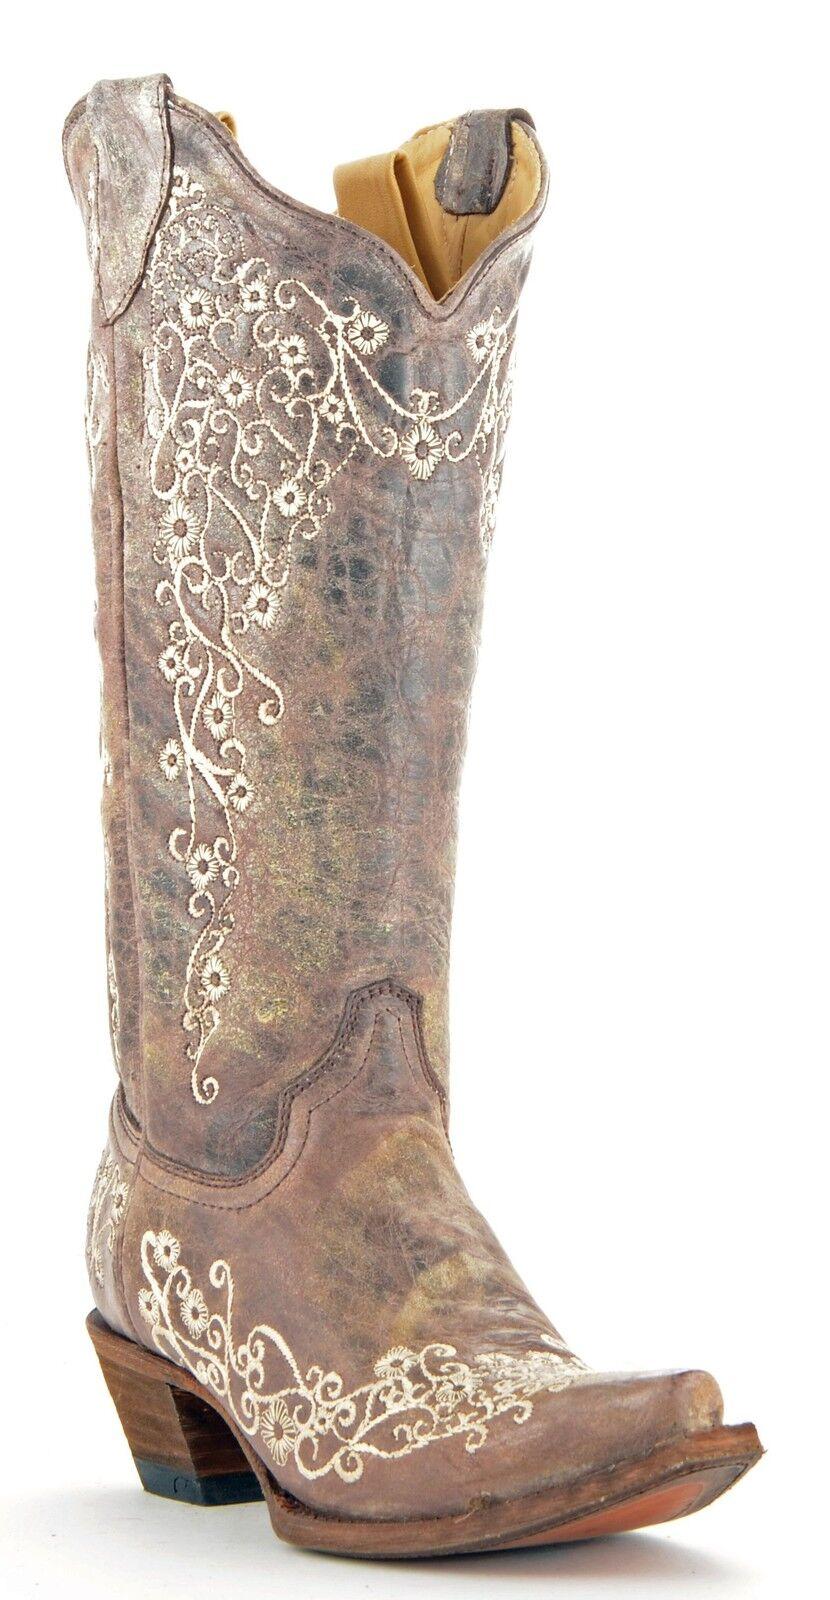 Damenschuhe Corral Western Boot Boot Western Distressed Braun Crater Bone Embroidery SnipToe A1094 688698